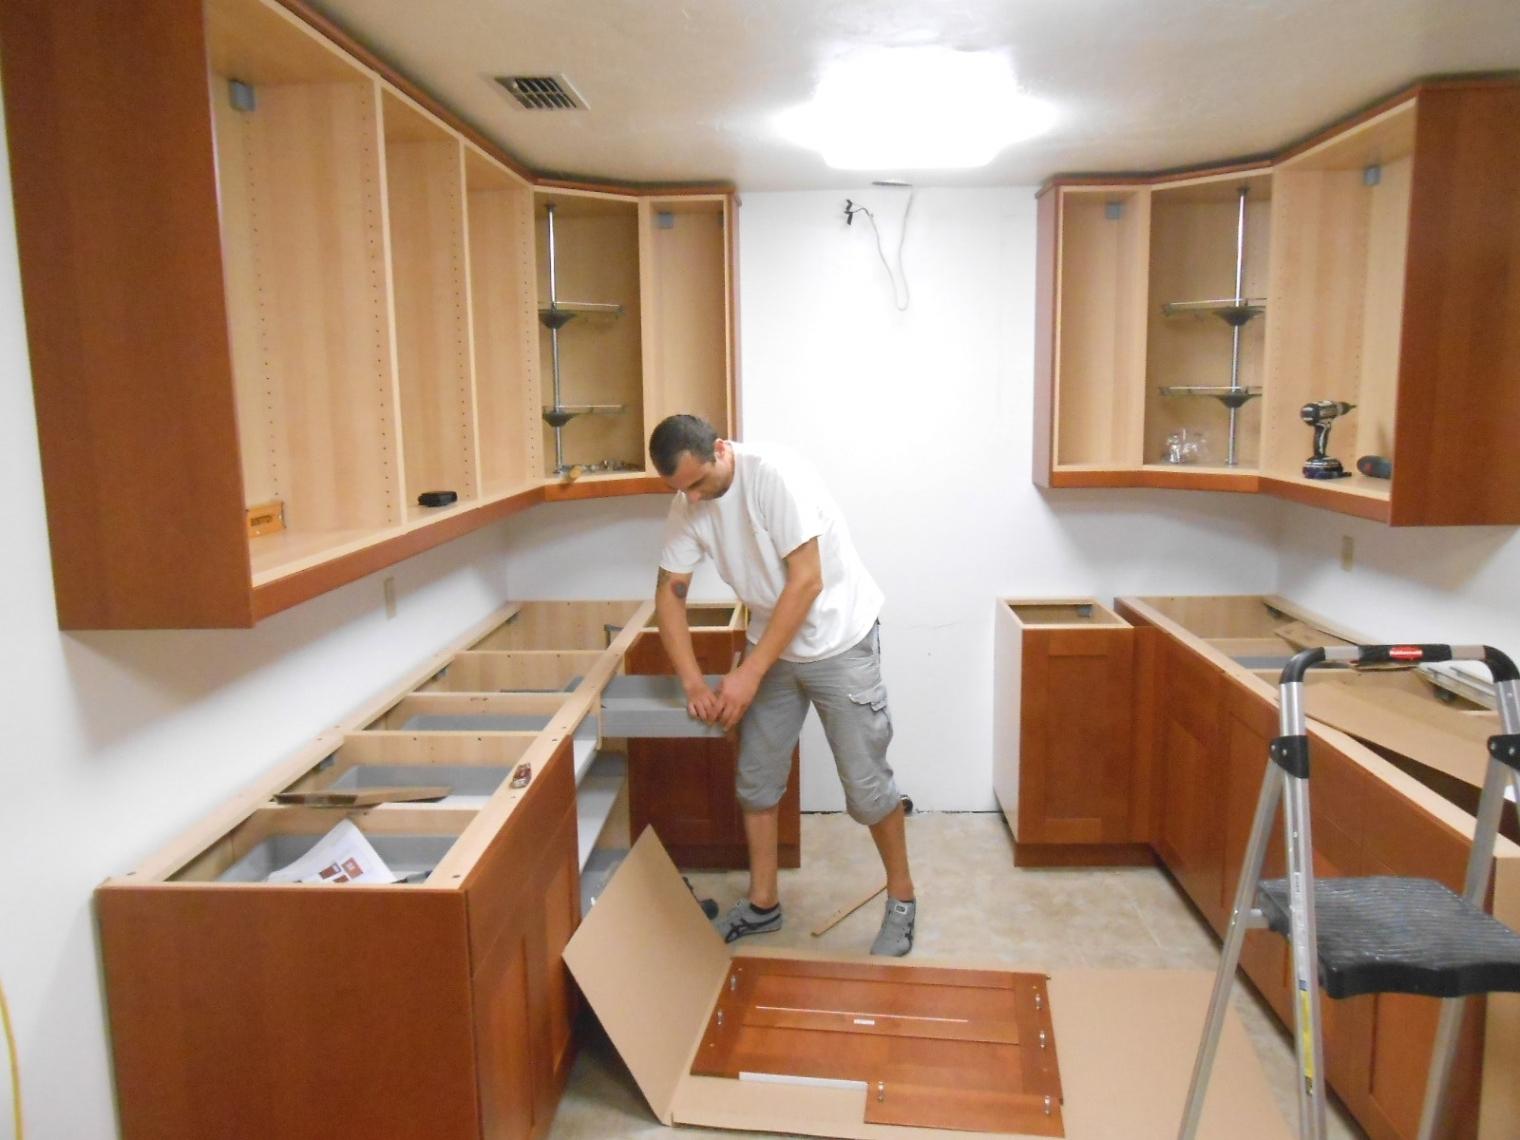 Diy Install Beautiful New Kitchen Cabinets Interiordesign